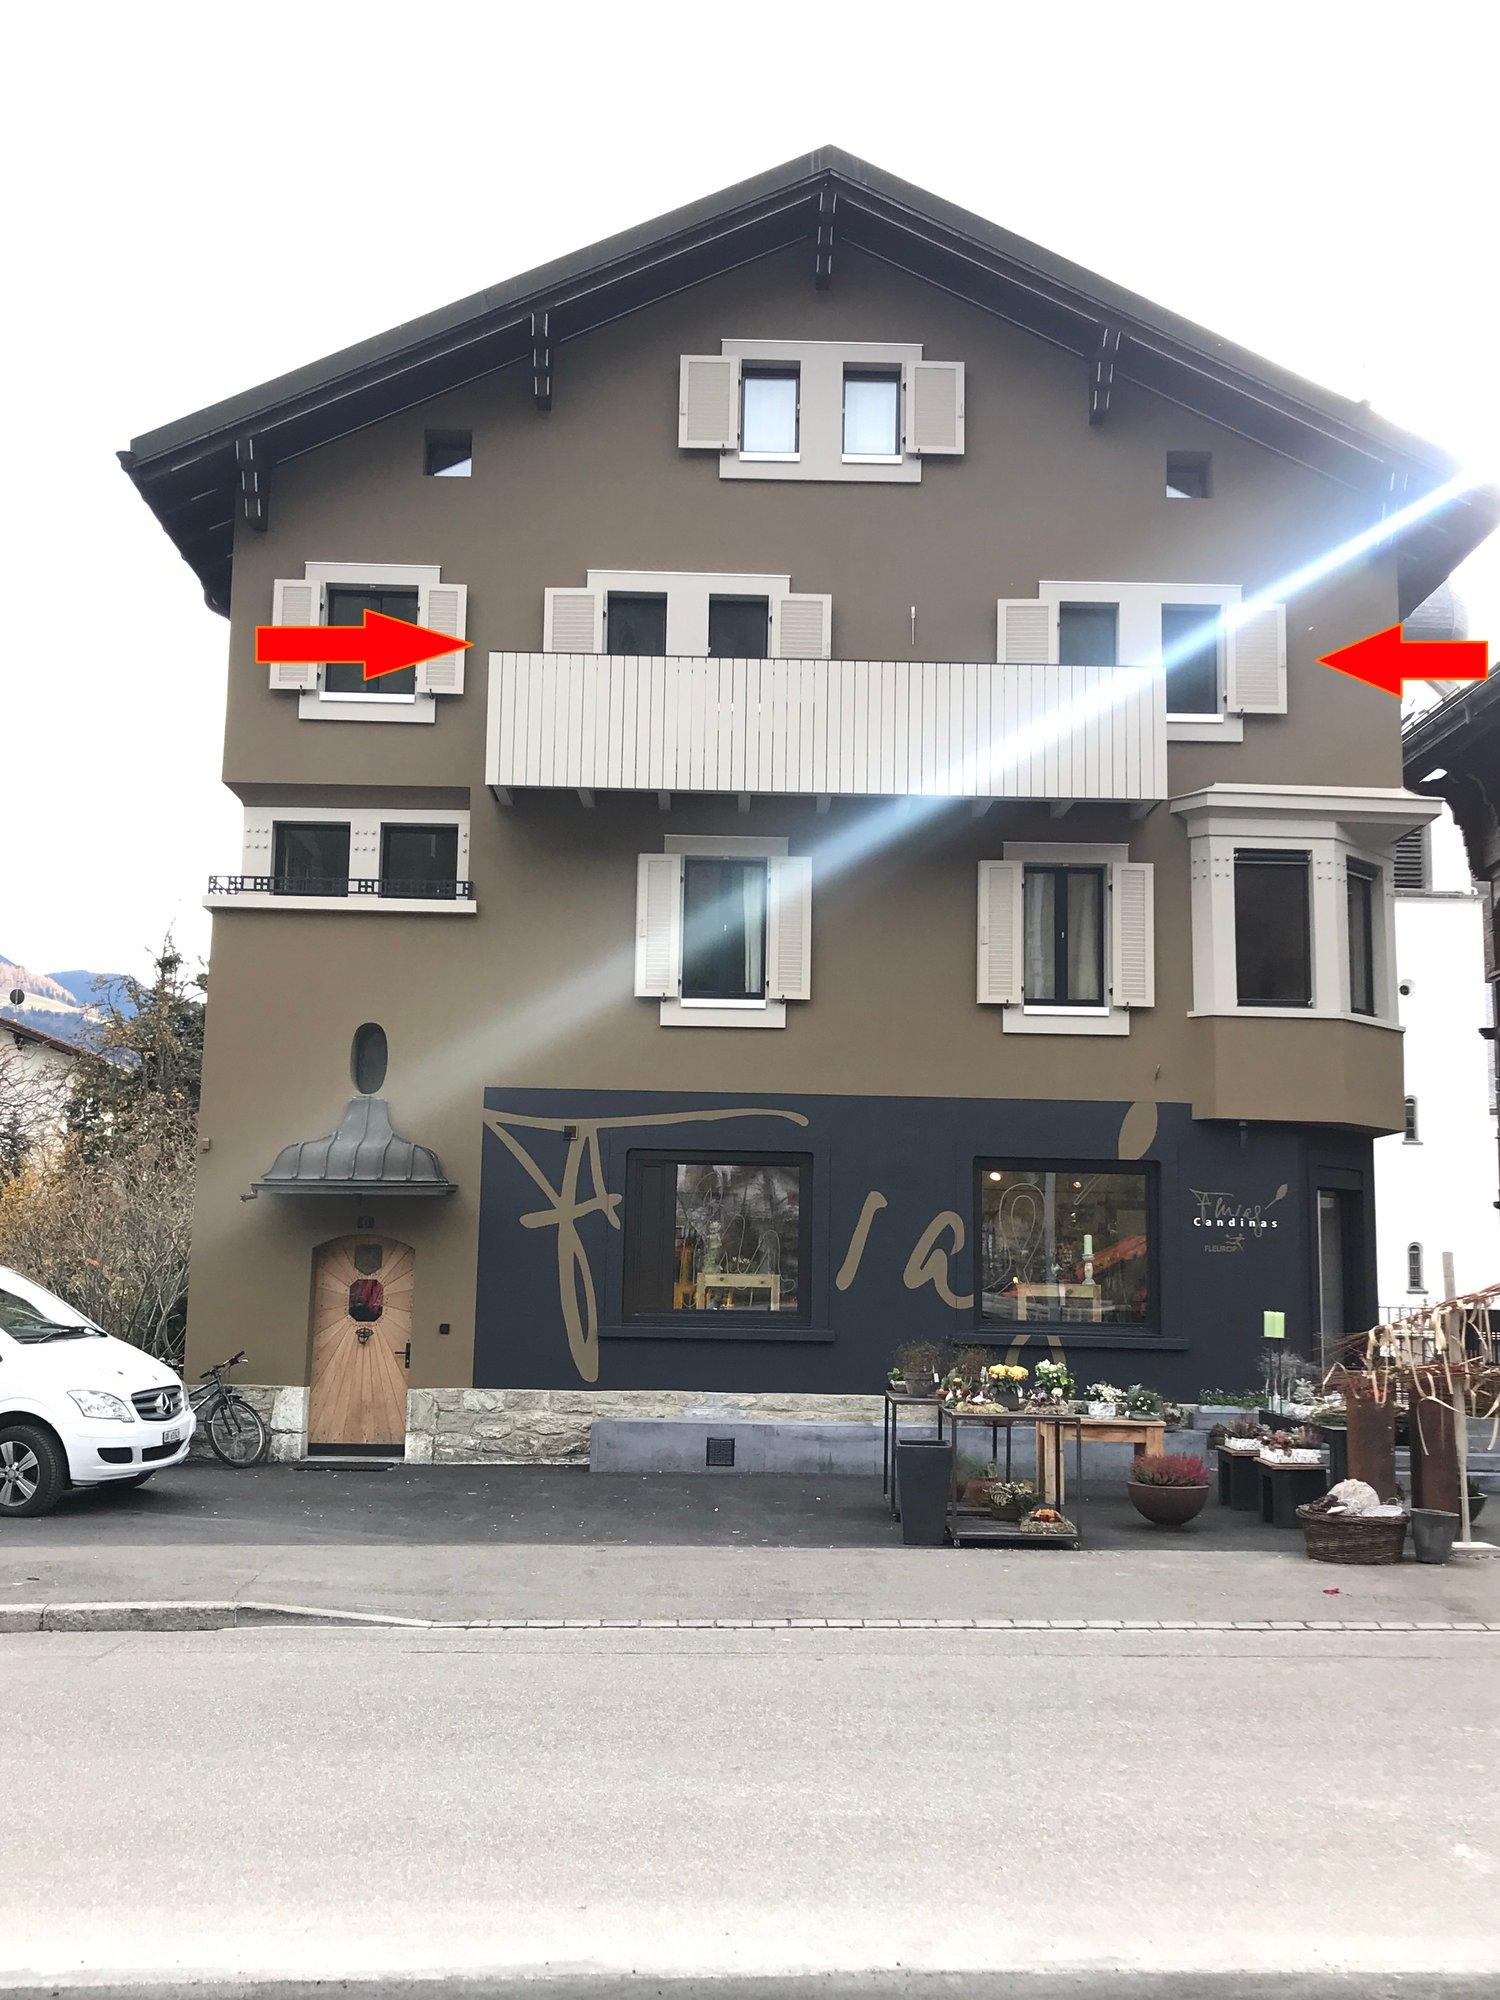 Bahnhofstrasse 6